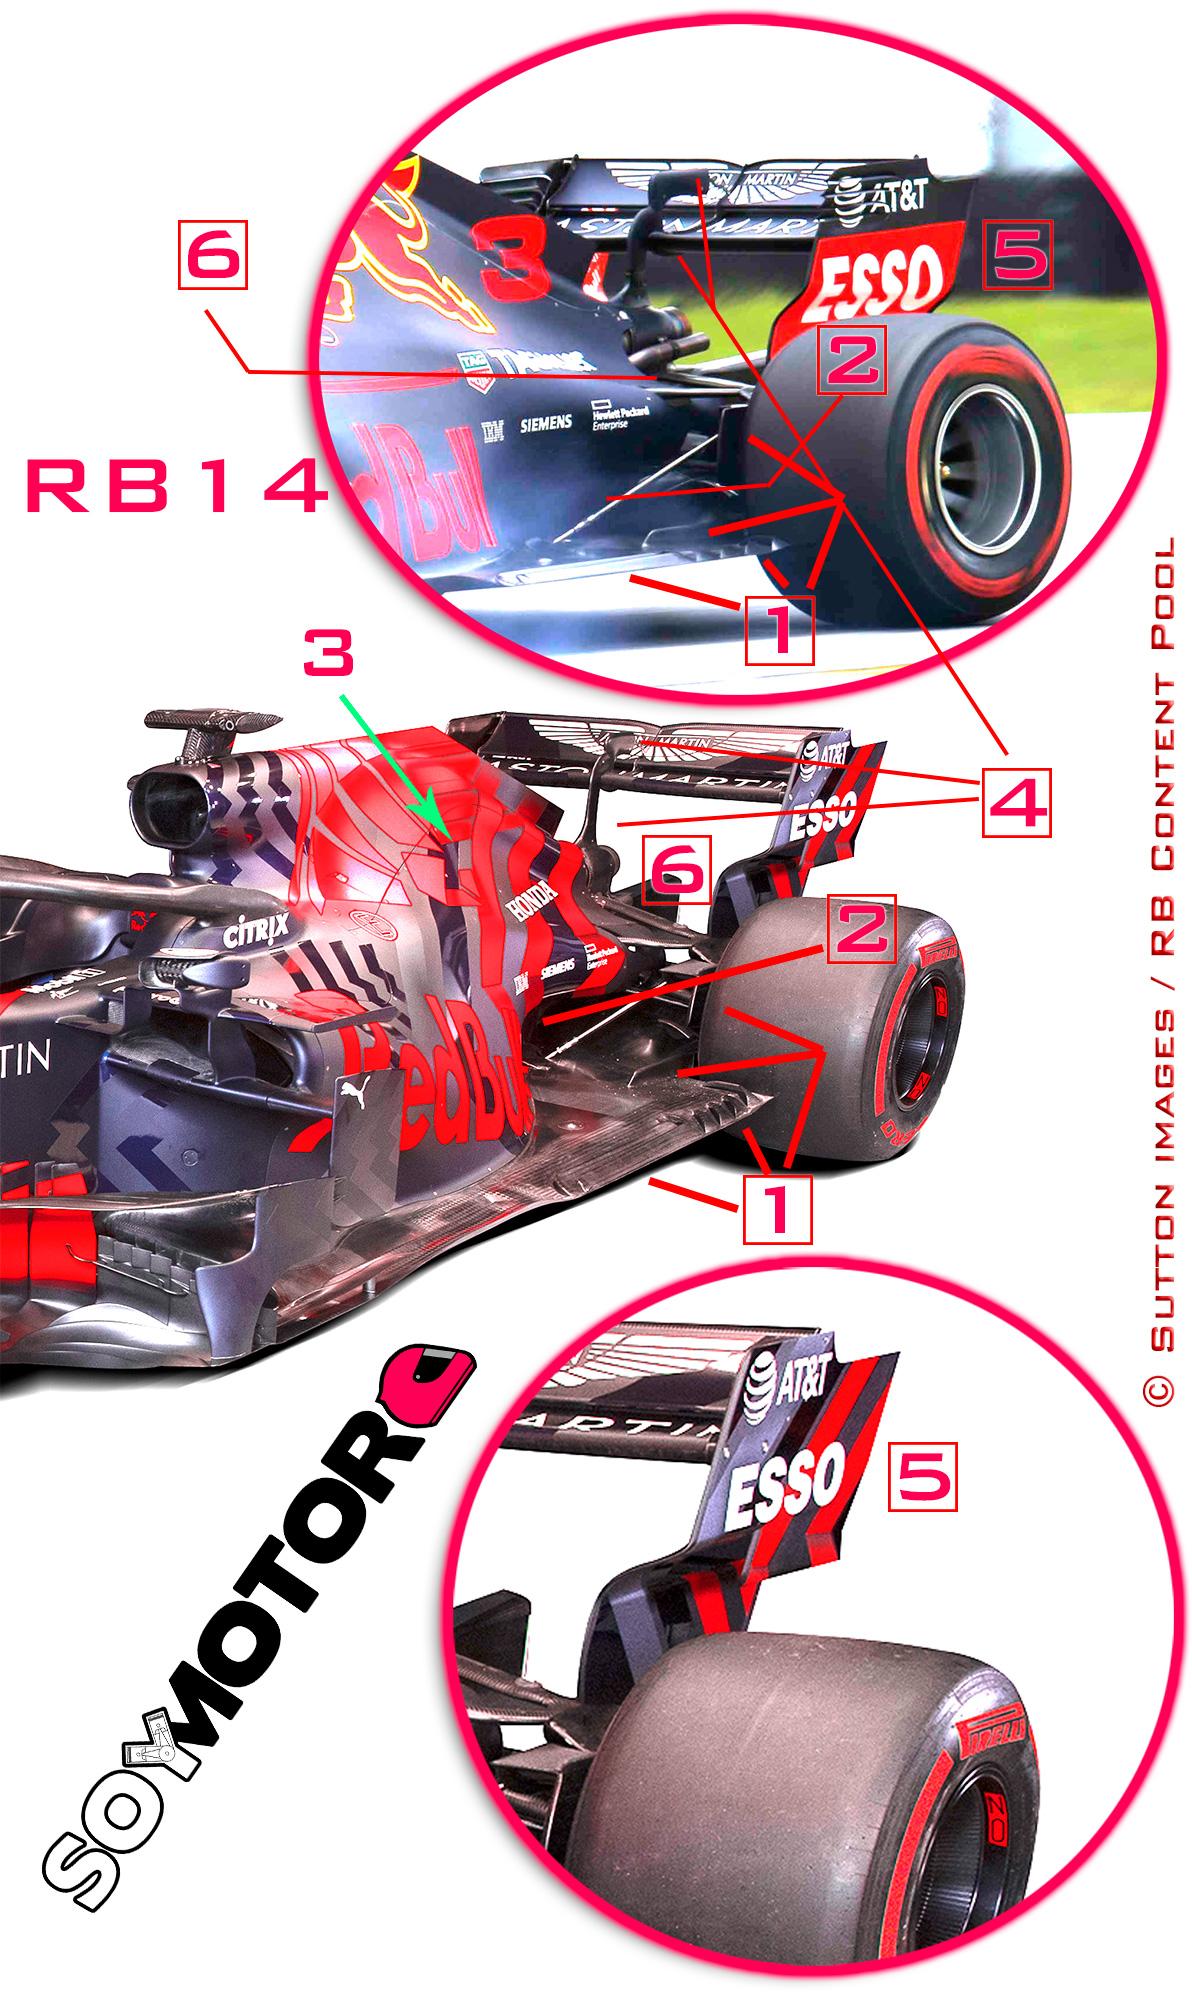 red-bull-trasera-y-detalles-soymotor.jpg